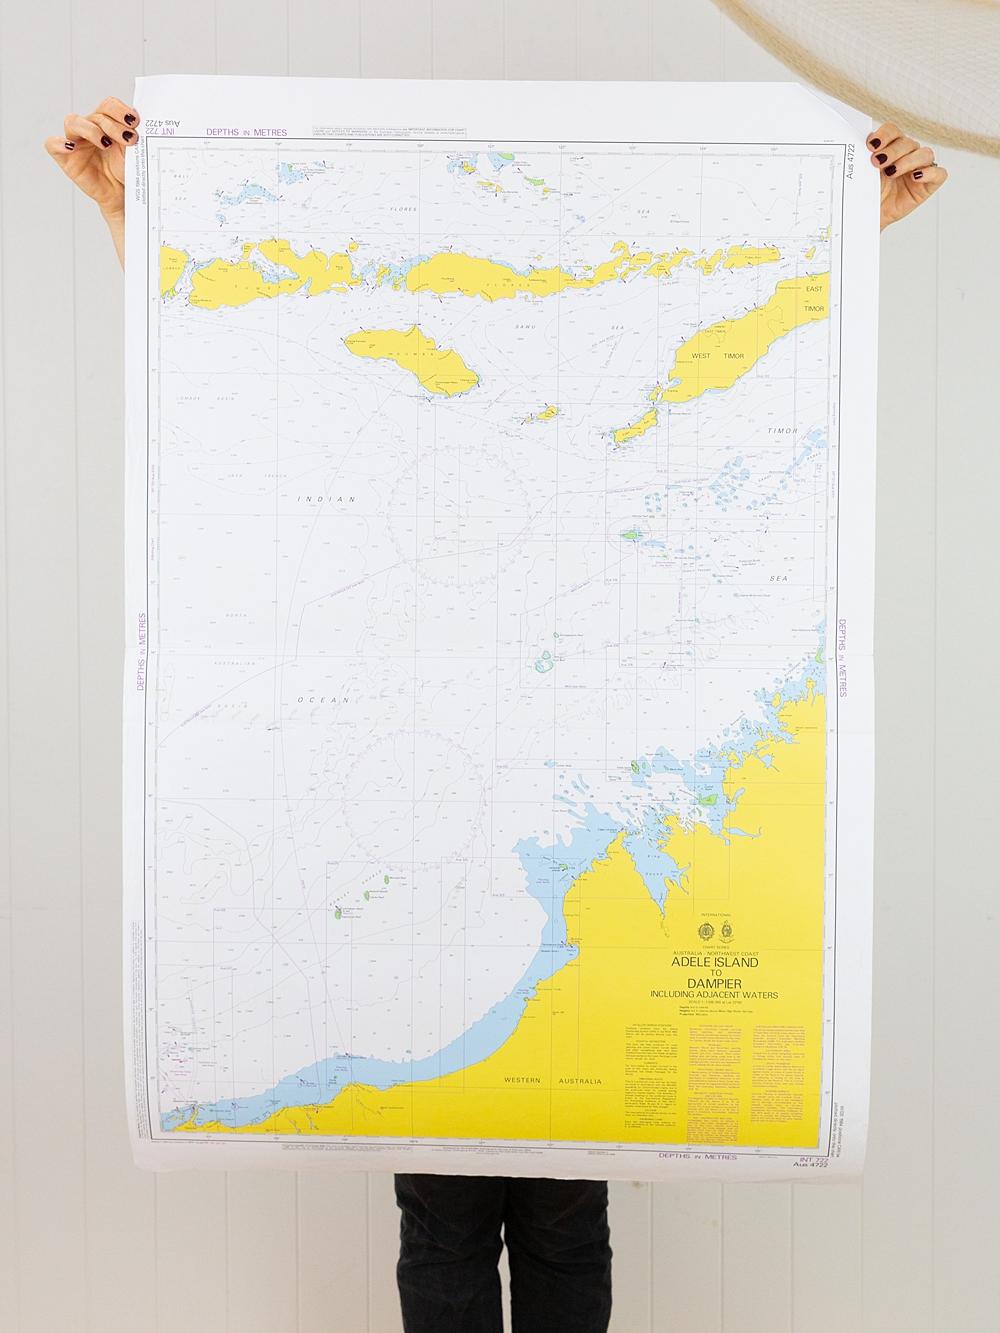 WA - Adele Island to Dampier Chart/Map